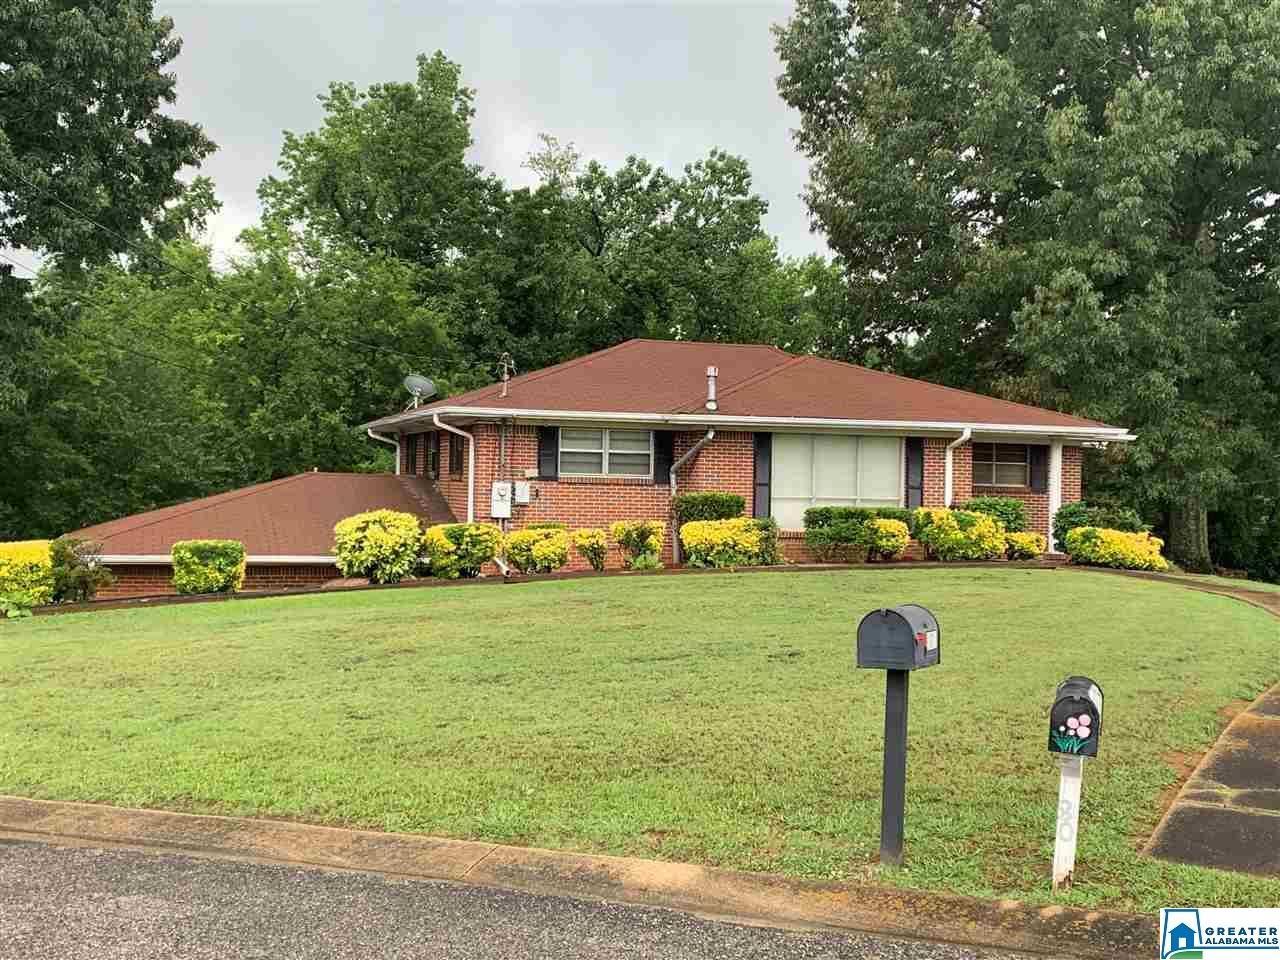 801 PLEASANT GROVE RD, Pleasant Grove, AL 35127 - MLS#: 887336